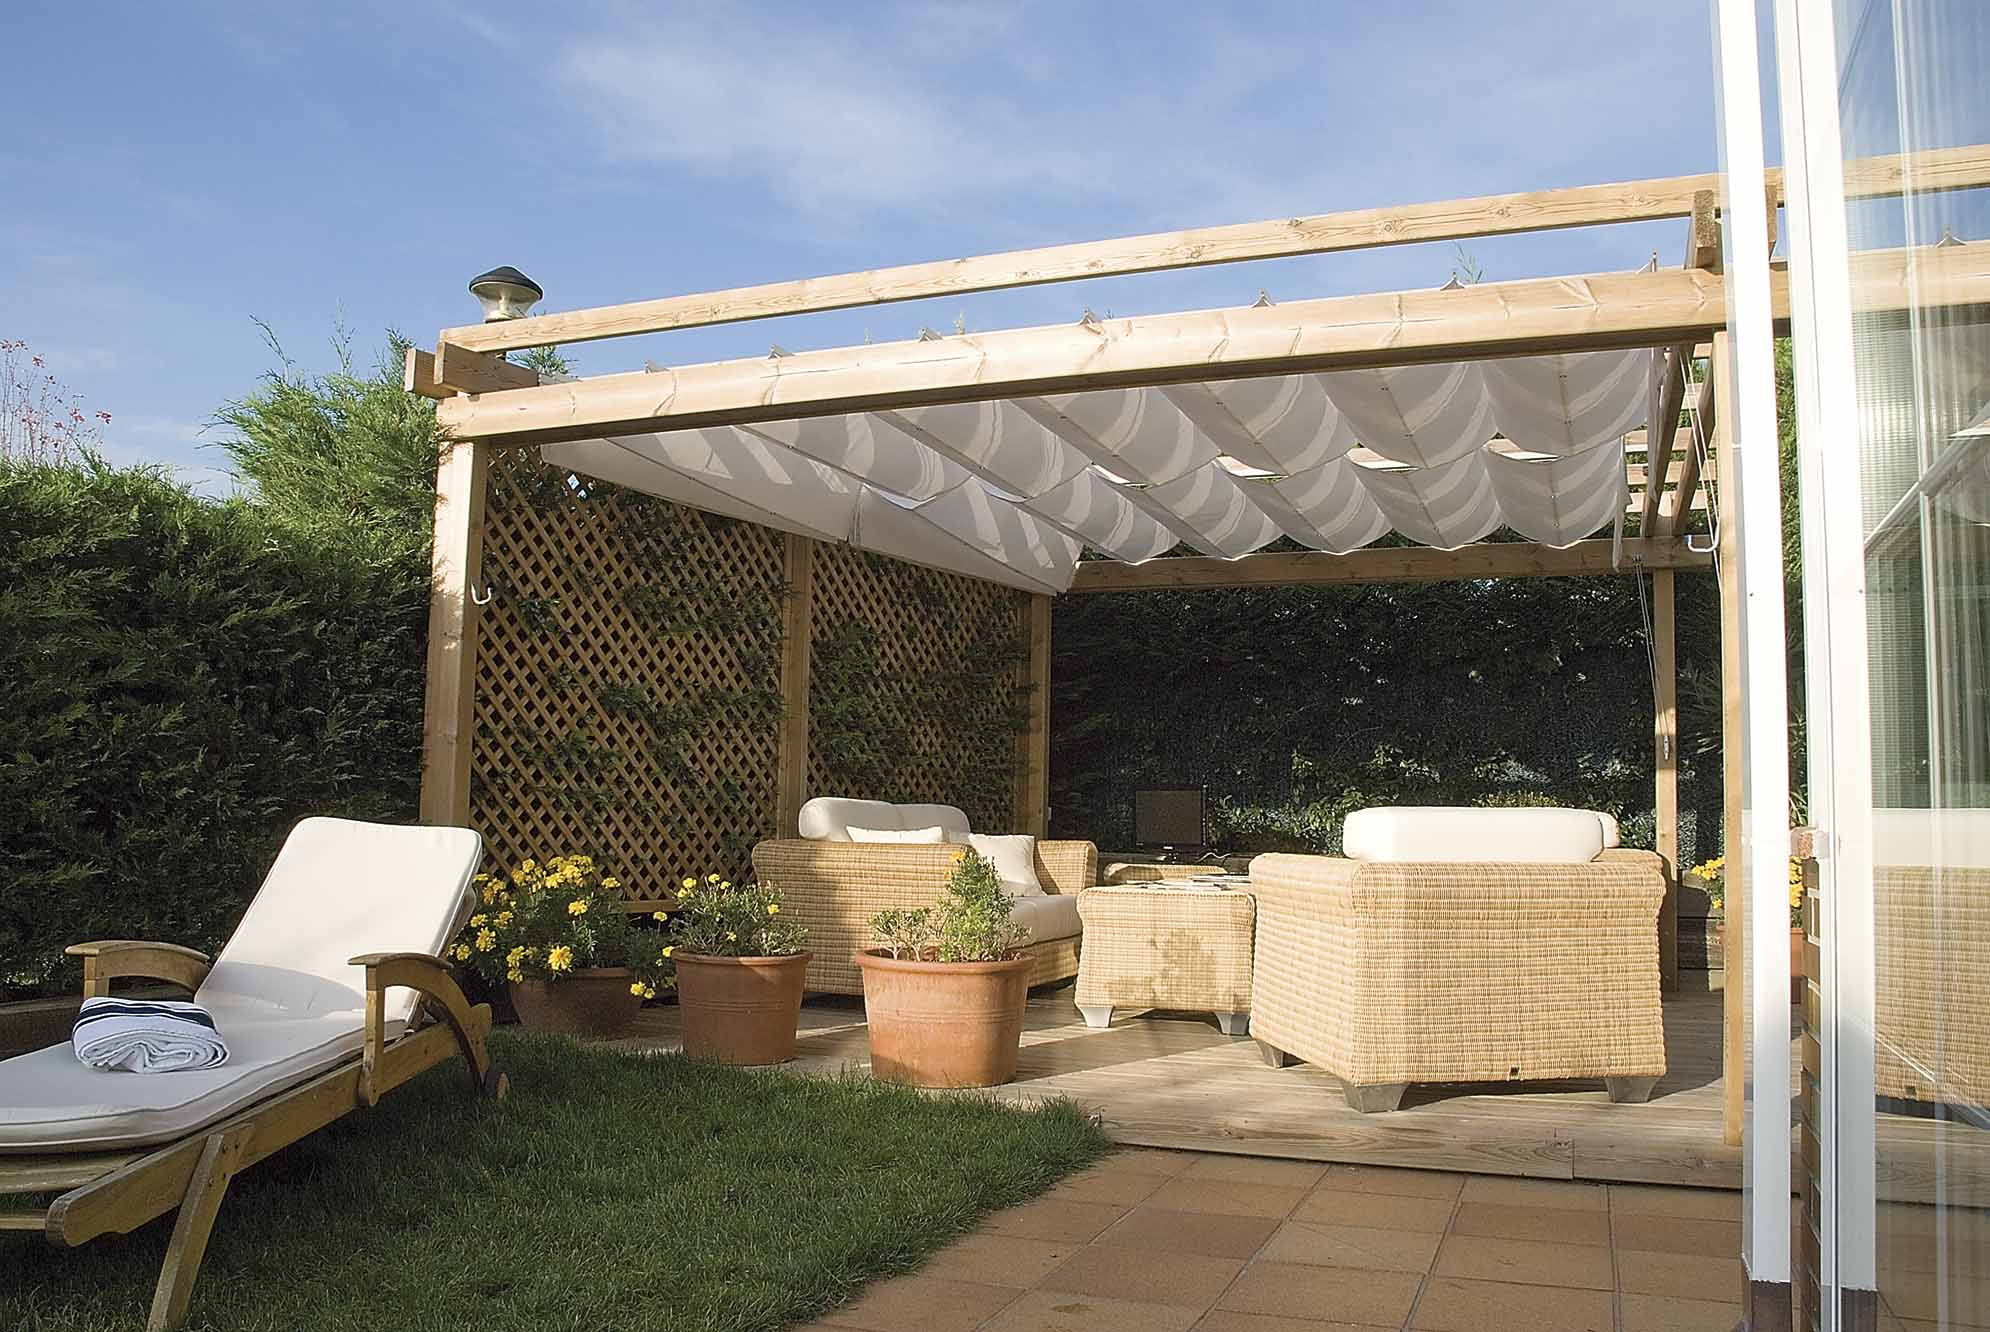 toldos-porche-jardin-exterior-10